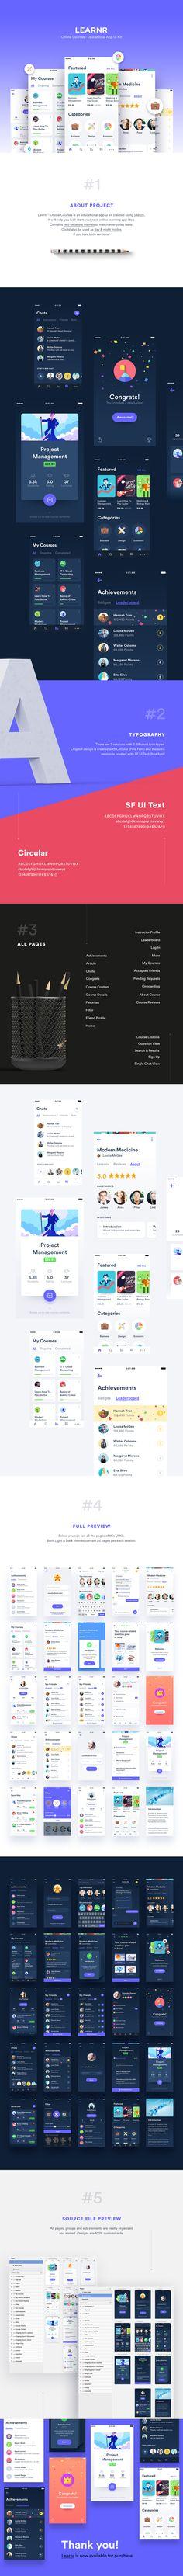 Learnr - Online Courses Educational App UI Kit on Behance Mobile Ui Design, App Ui Design, User Interface Design, Module Design, Site Vitrine, Applications Mobiles, App Design Inspiration, Mobile App Ui, User Experience Design